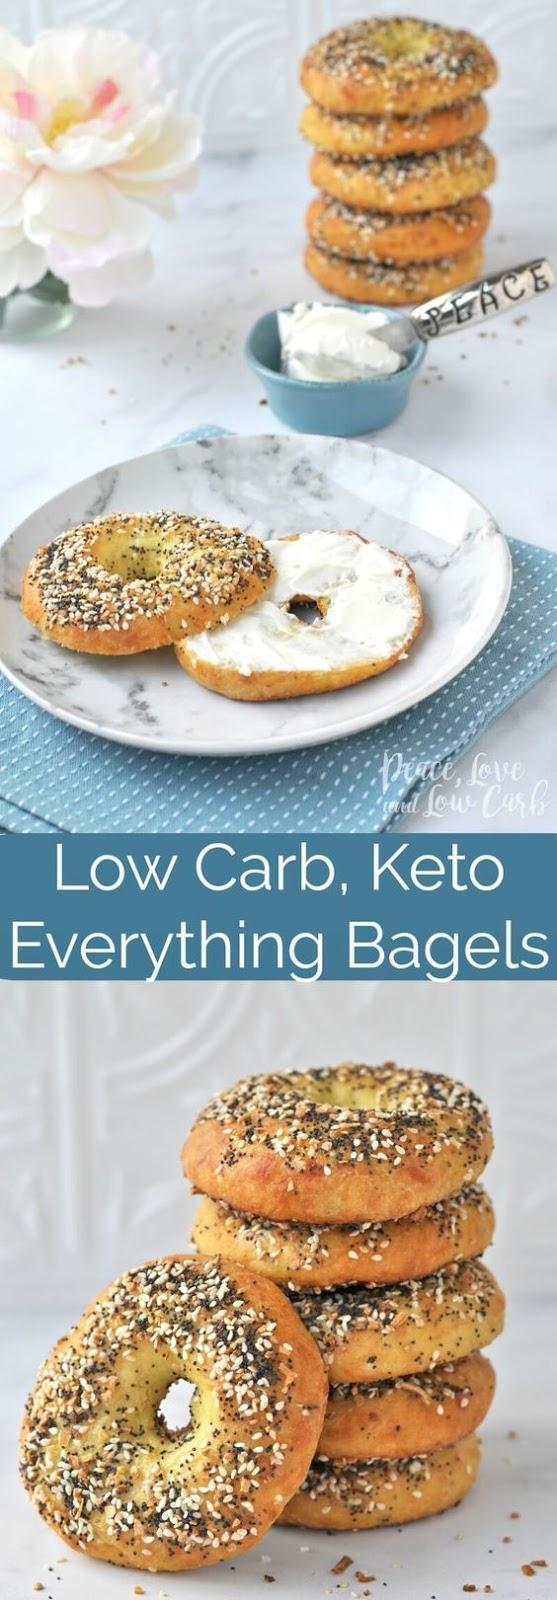 Low Carb Keto Everything Bagels